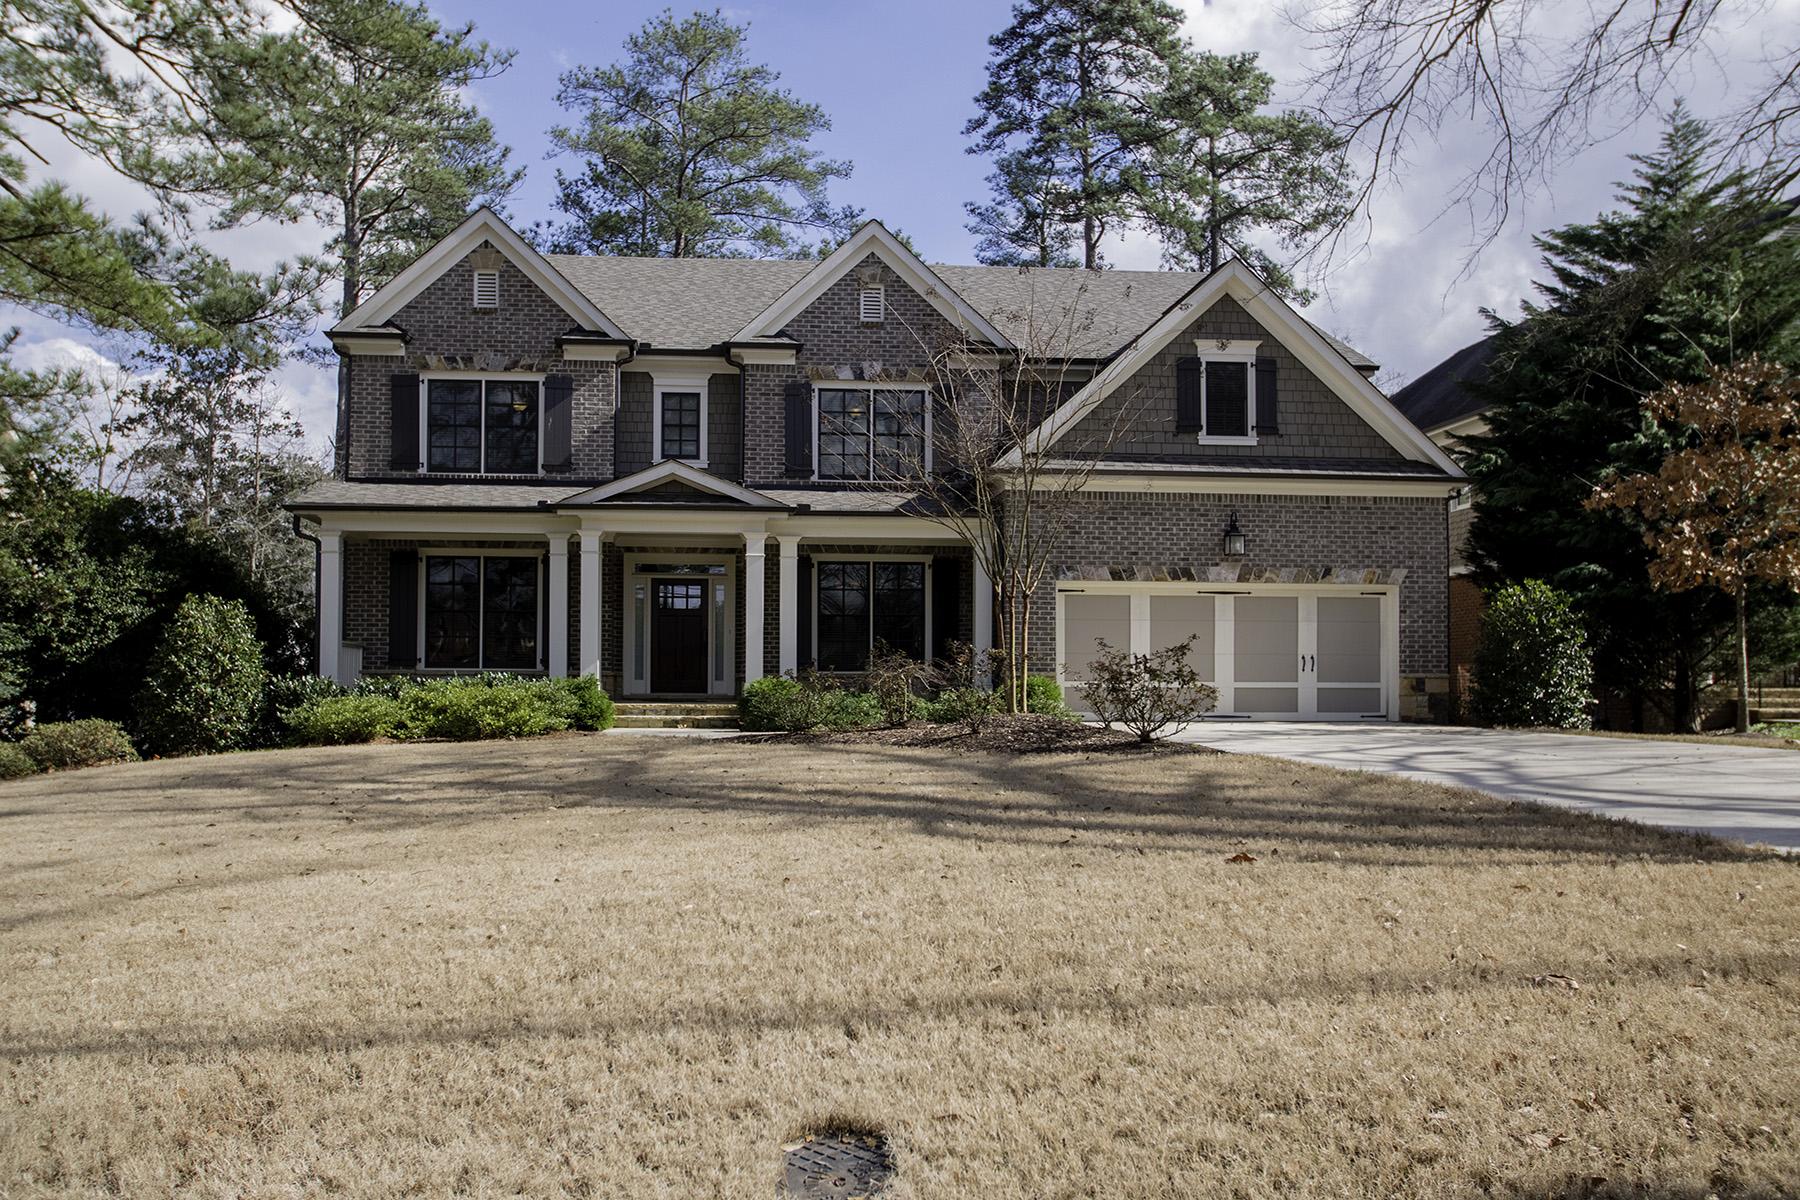 Single Family Home for Sale at TranquilityinBrookhaven'sDesiredAshfordPark 2721 Caldwell Rd Brookhaven, Georgia 30319 United States